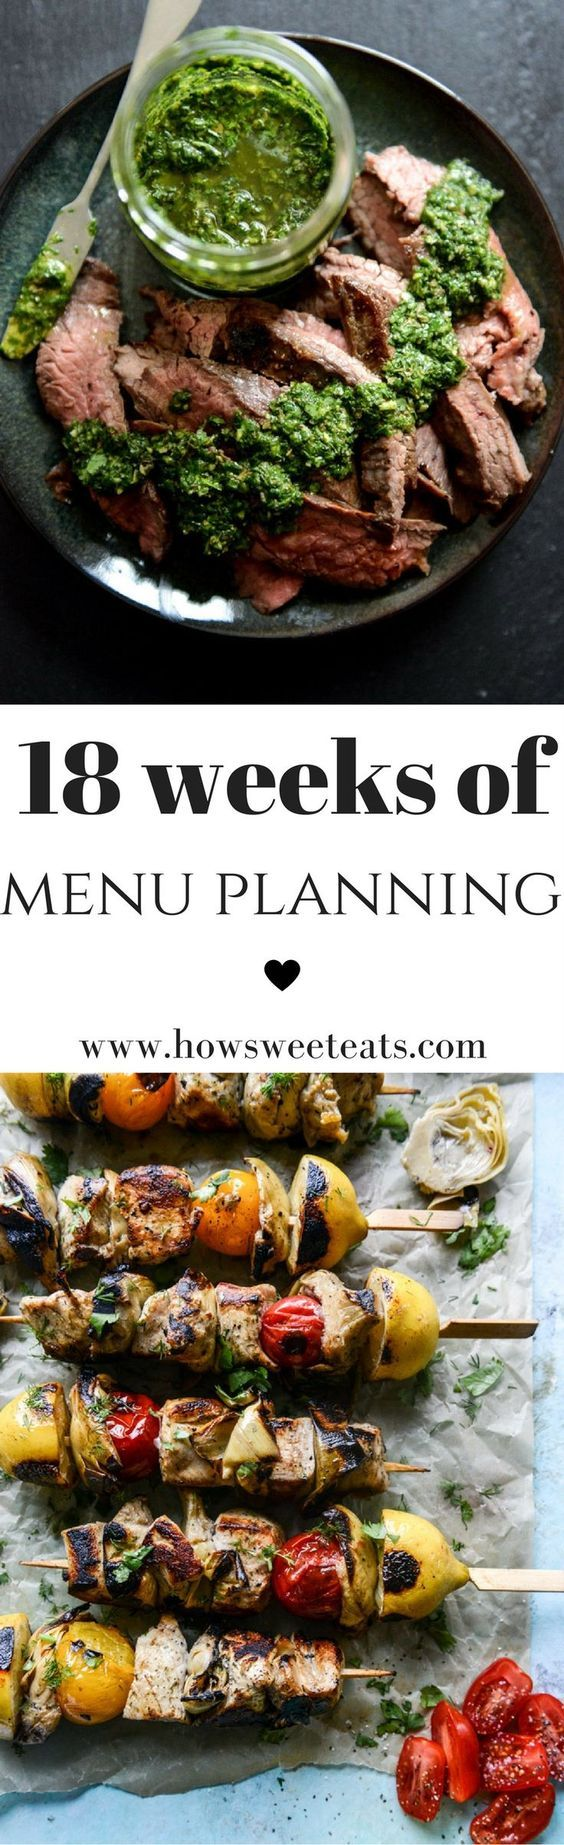 18 weeks of menu plans - 126 lightened up meal ideas! I howsweeteats.com @howsweeteats